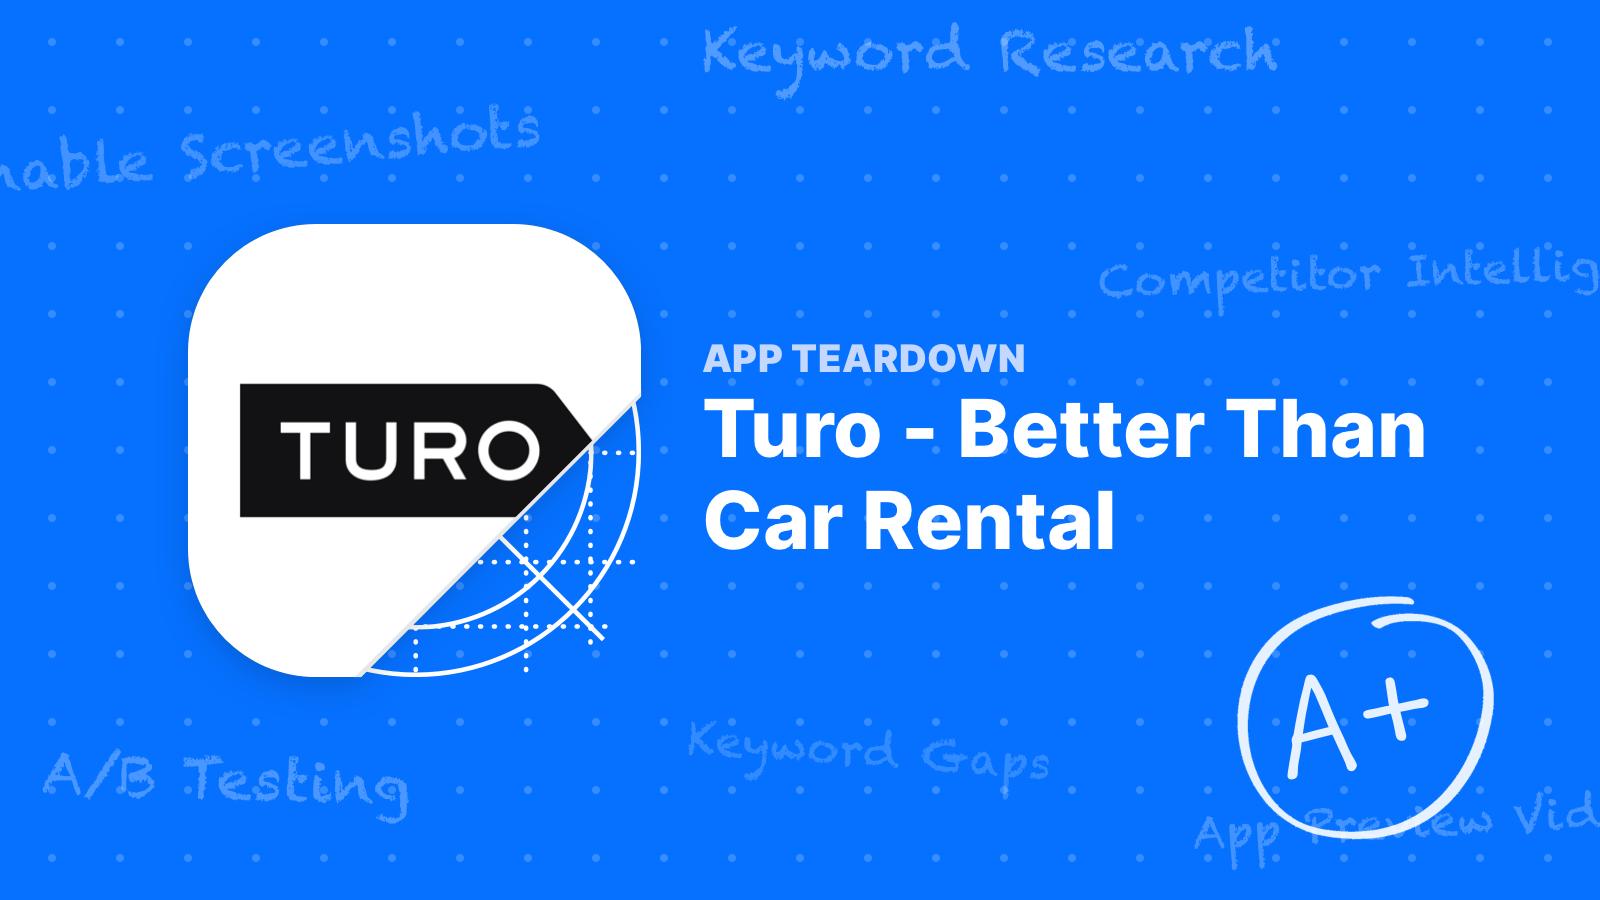 App Teardown - Turo Wins the Car Rental Game